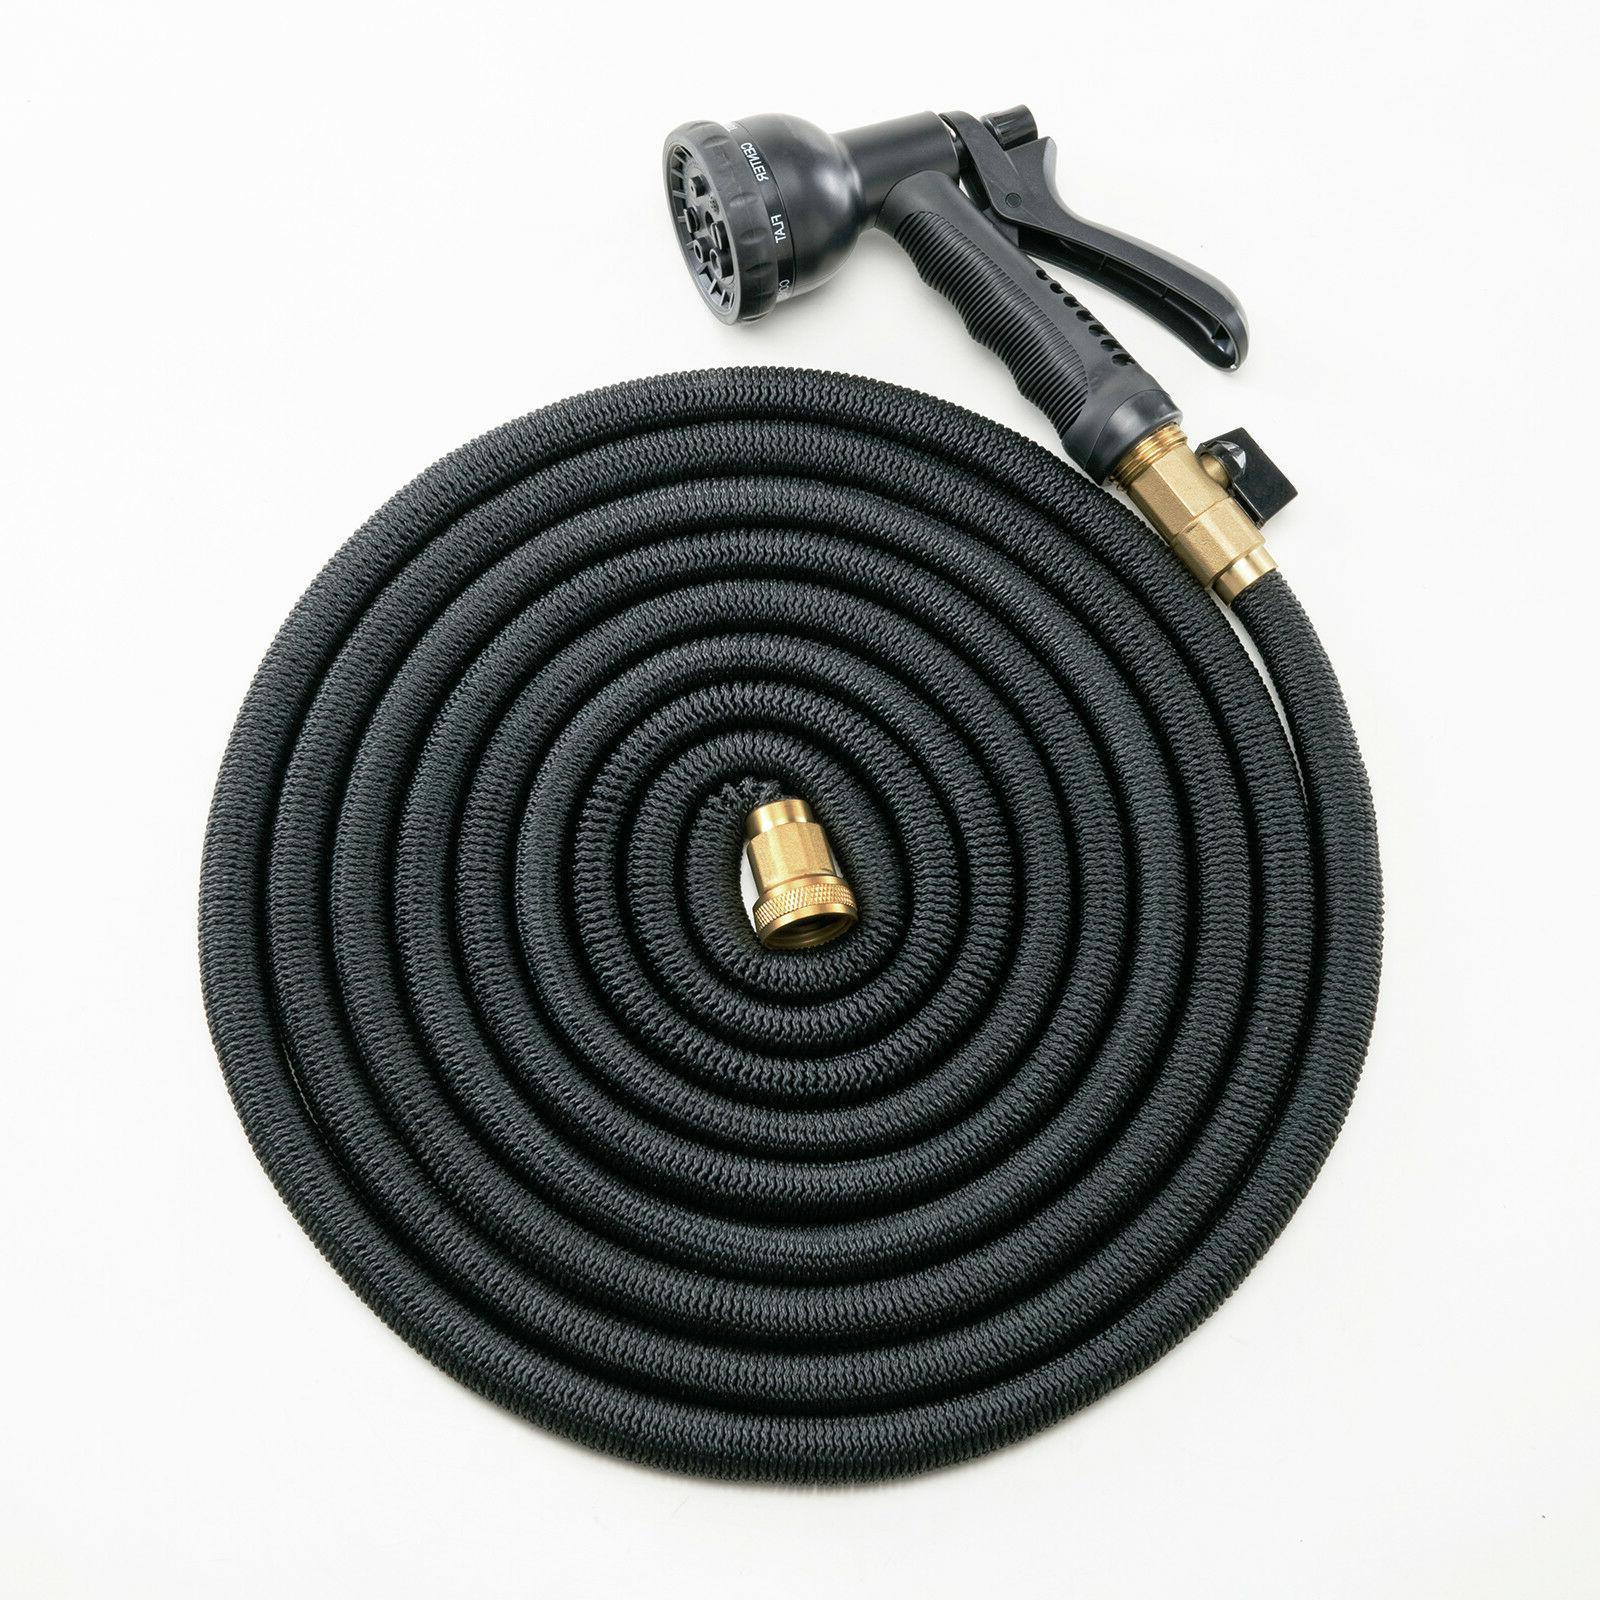 Deluxe 100 Feet Expandable Flexible w/ Spray Nozzle